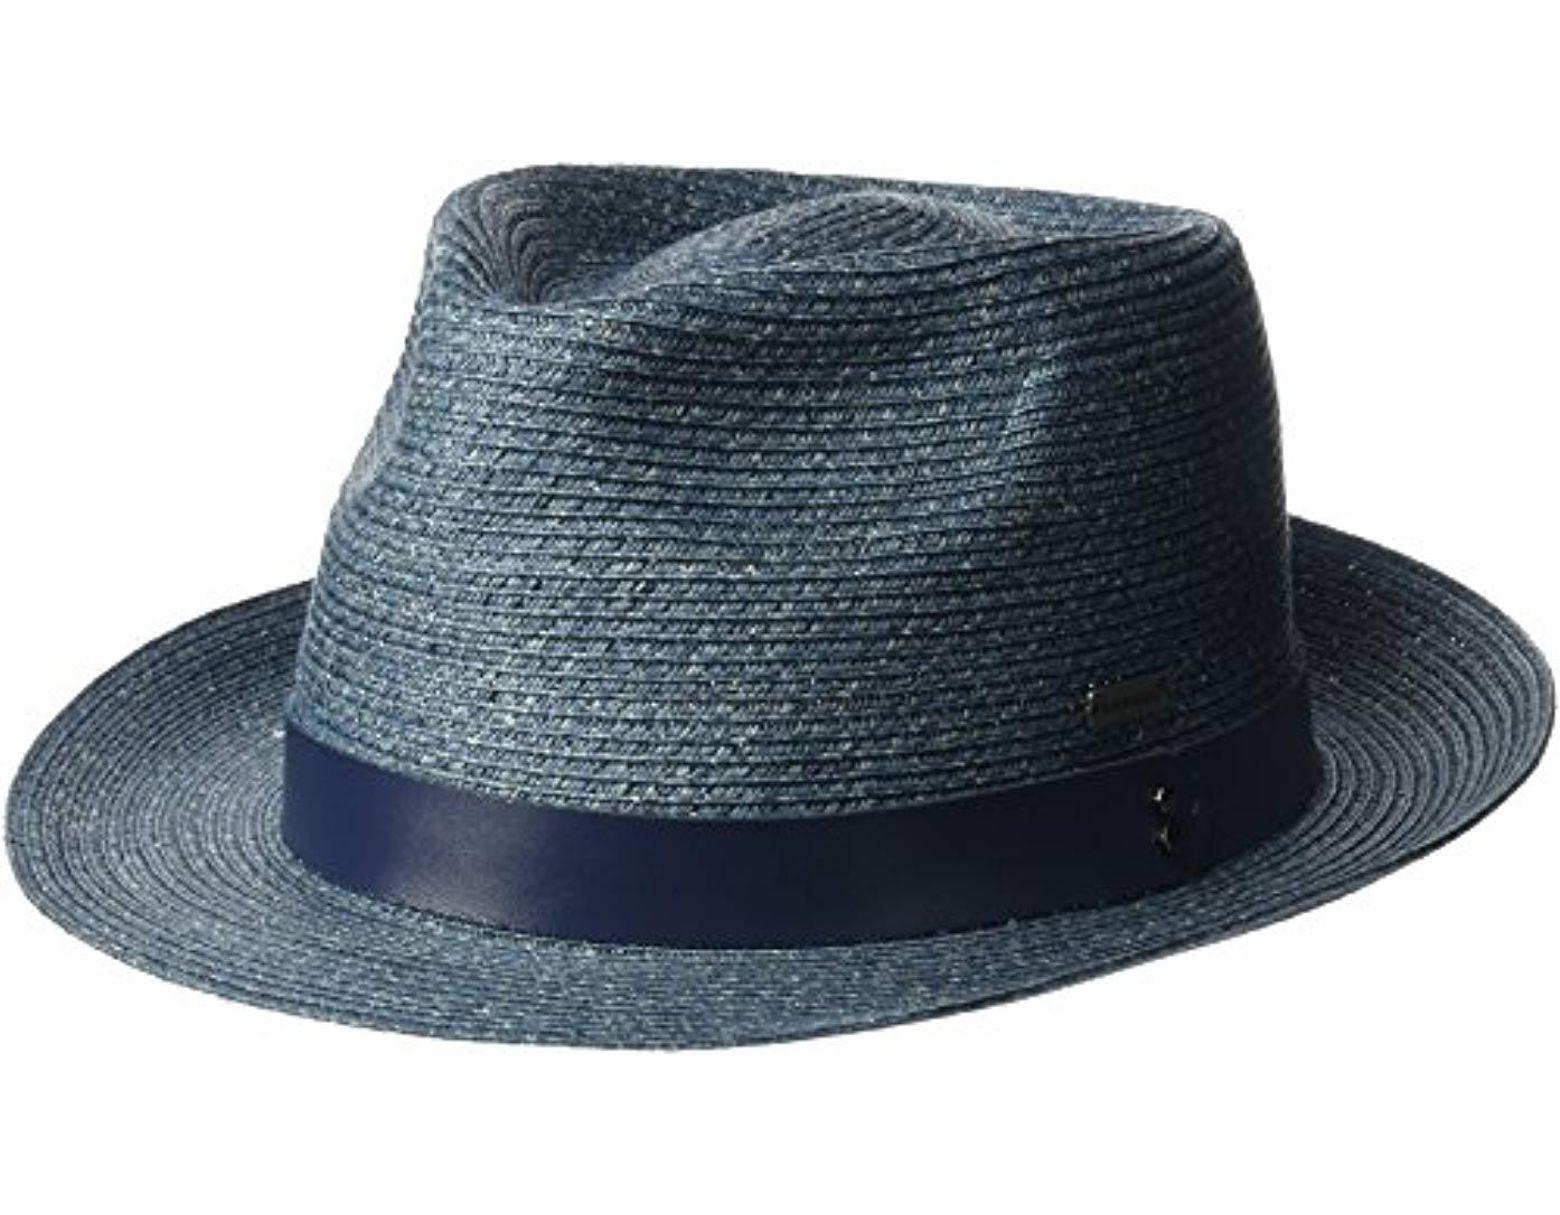 f8775b74 Kangol Waxed Braid Trilby Fedora Hat in Blue for Men - Save 18% - Lyst